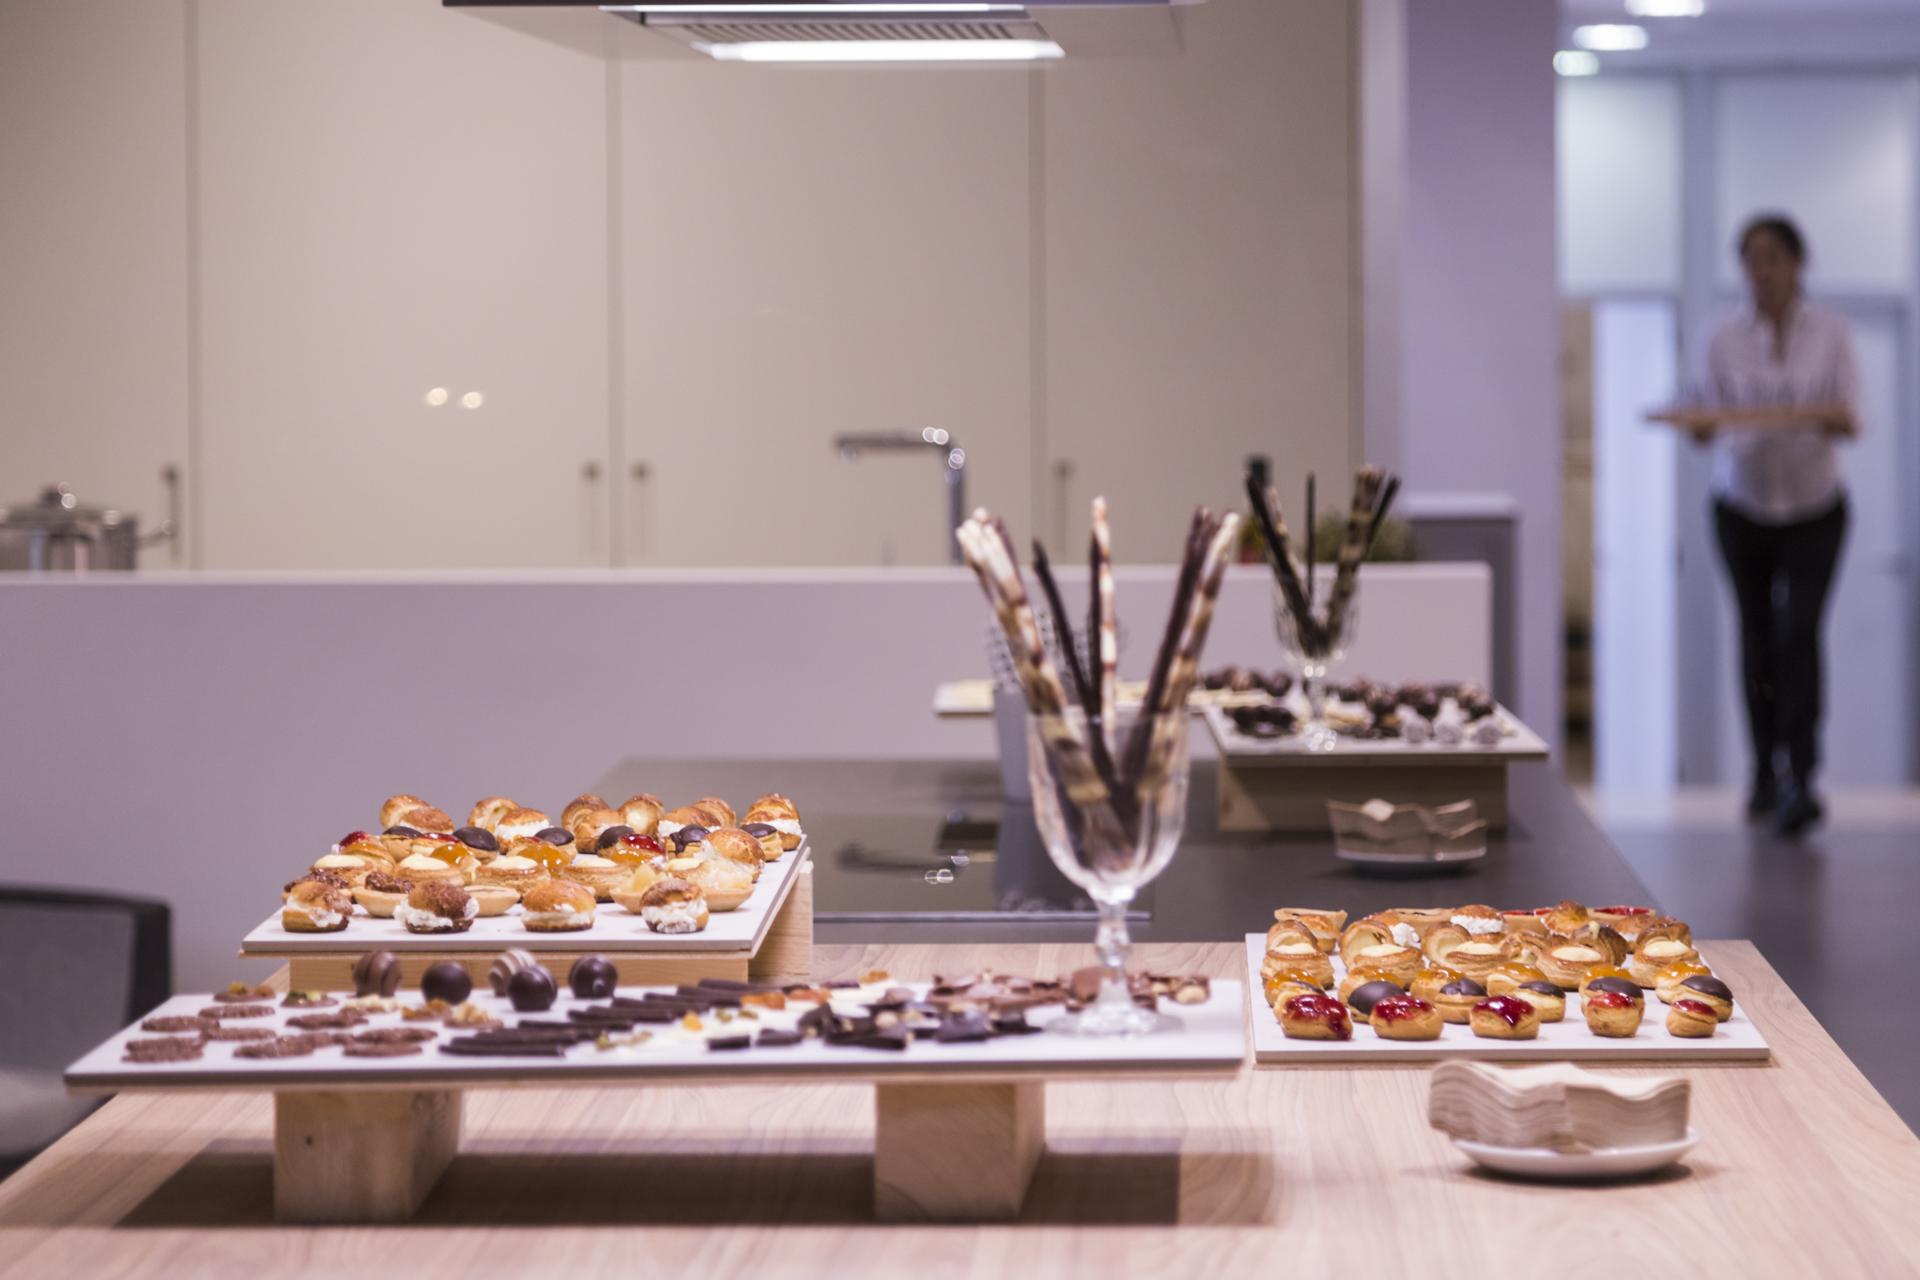 cocinas-santos-santiago-interiores-evento-showcooking-clientes-8